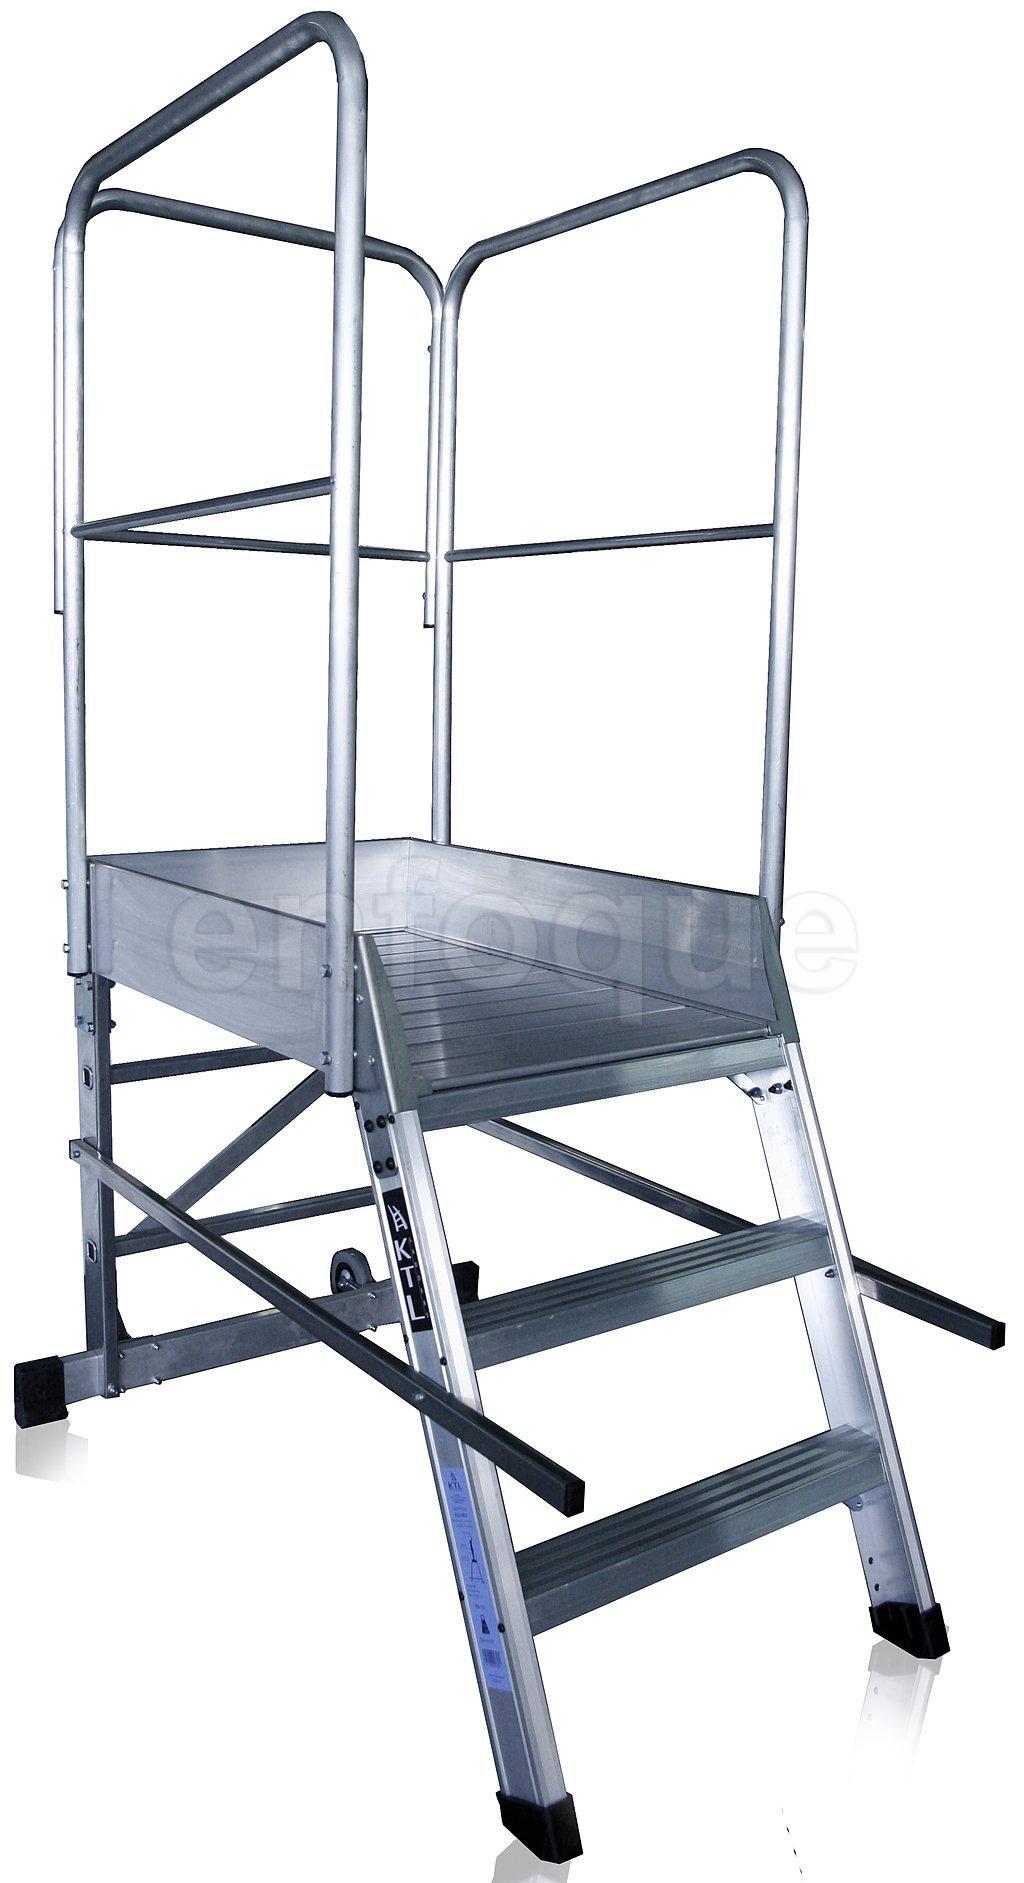 Escalera profesional de aluminio un acceso con plataforma de trabajo 3 peldaños 60x90 serie store 68º almacén: Amazon.es: Hogar